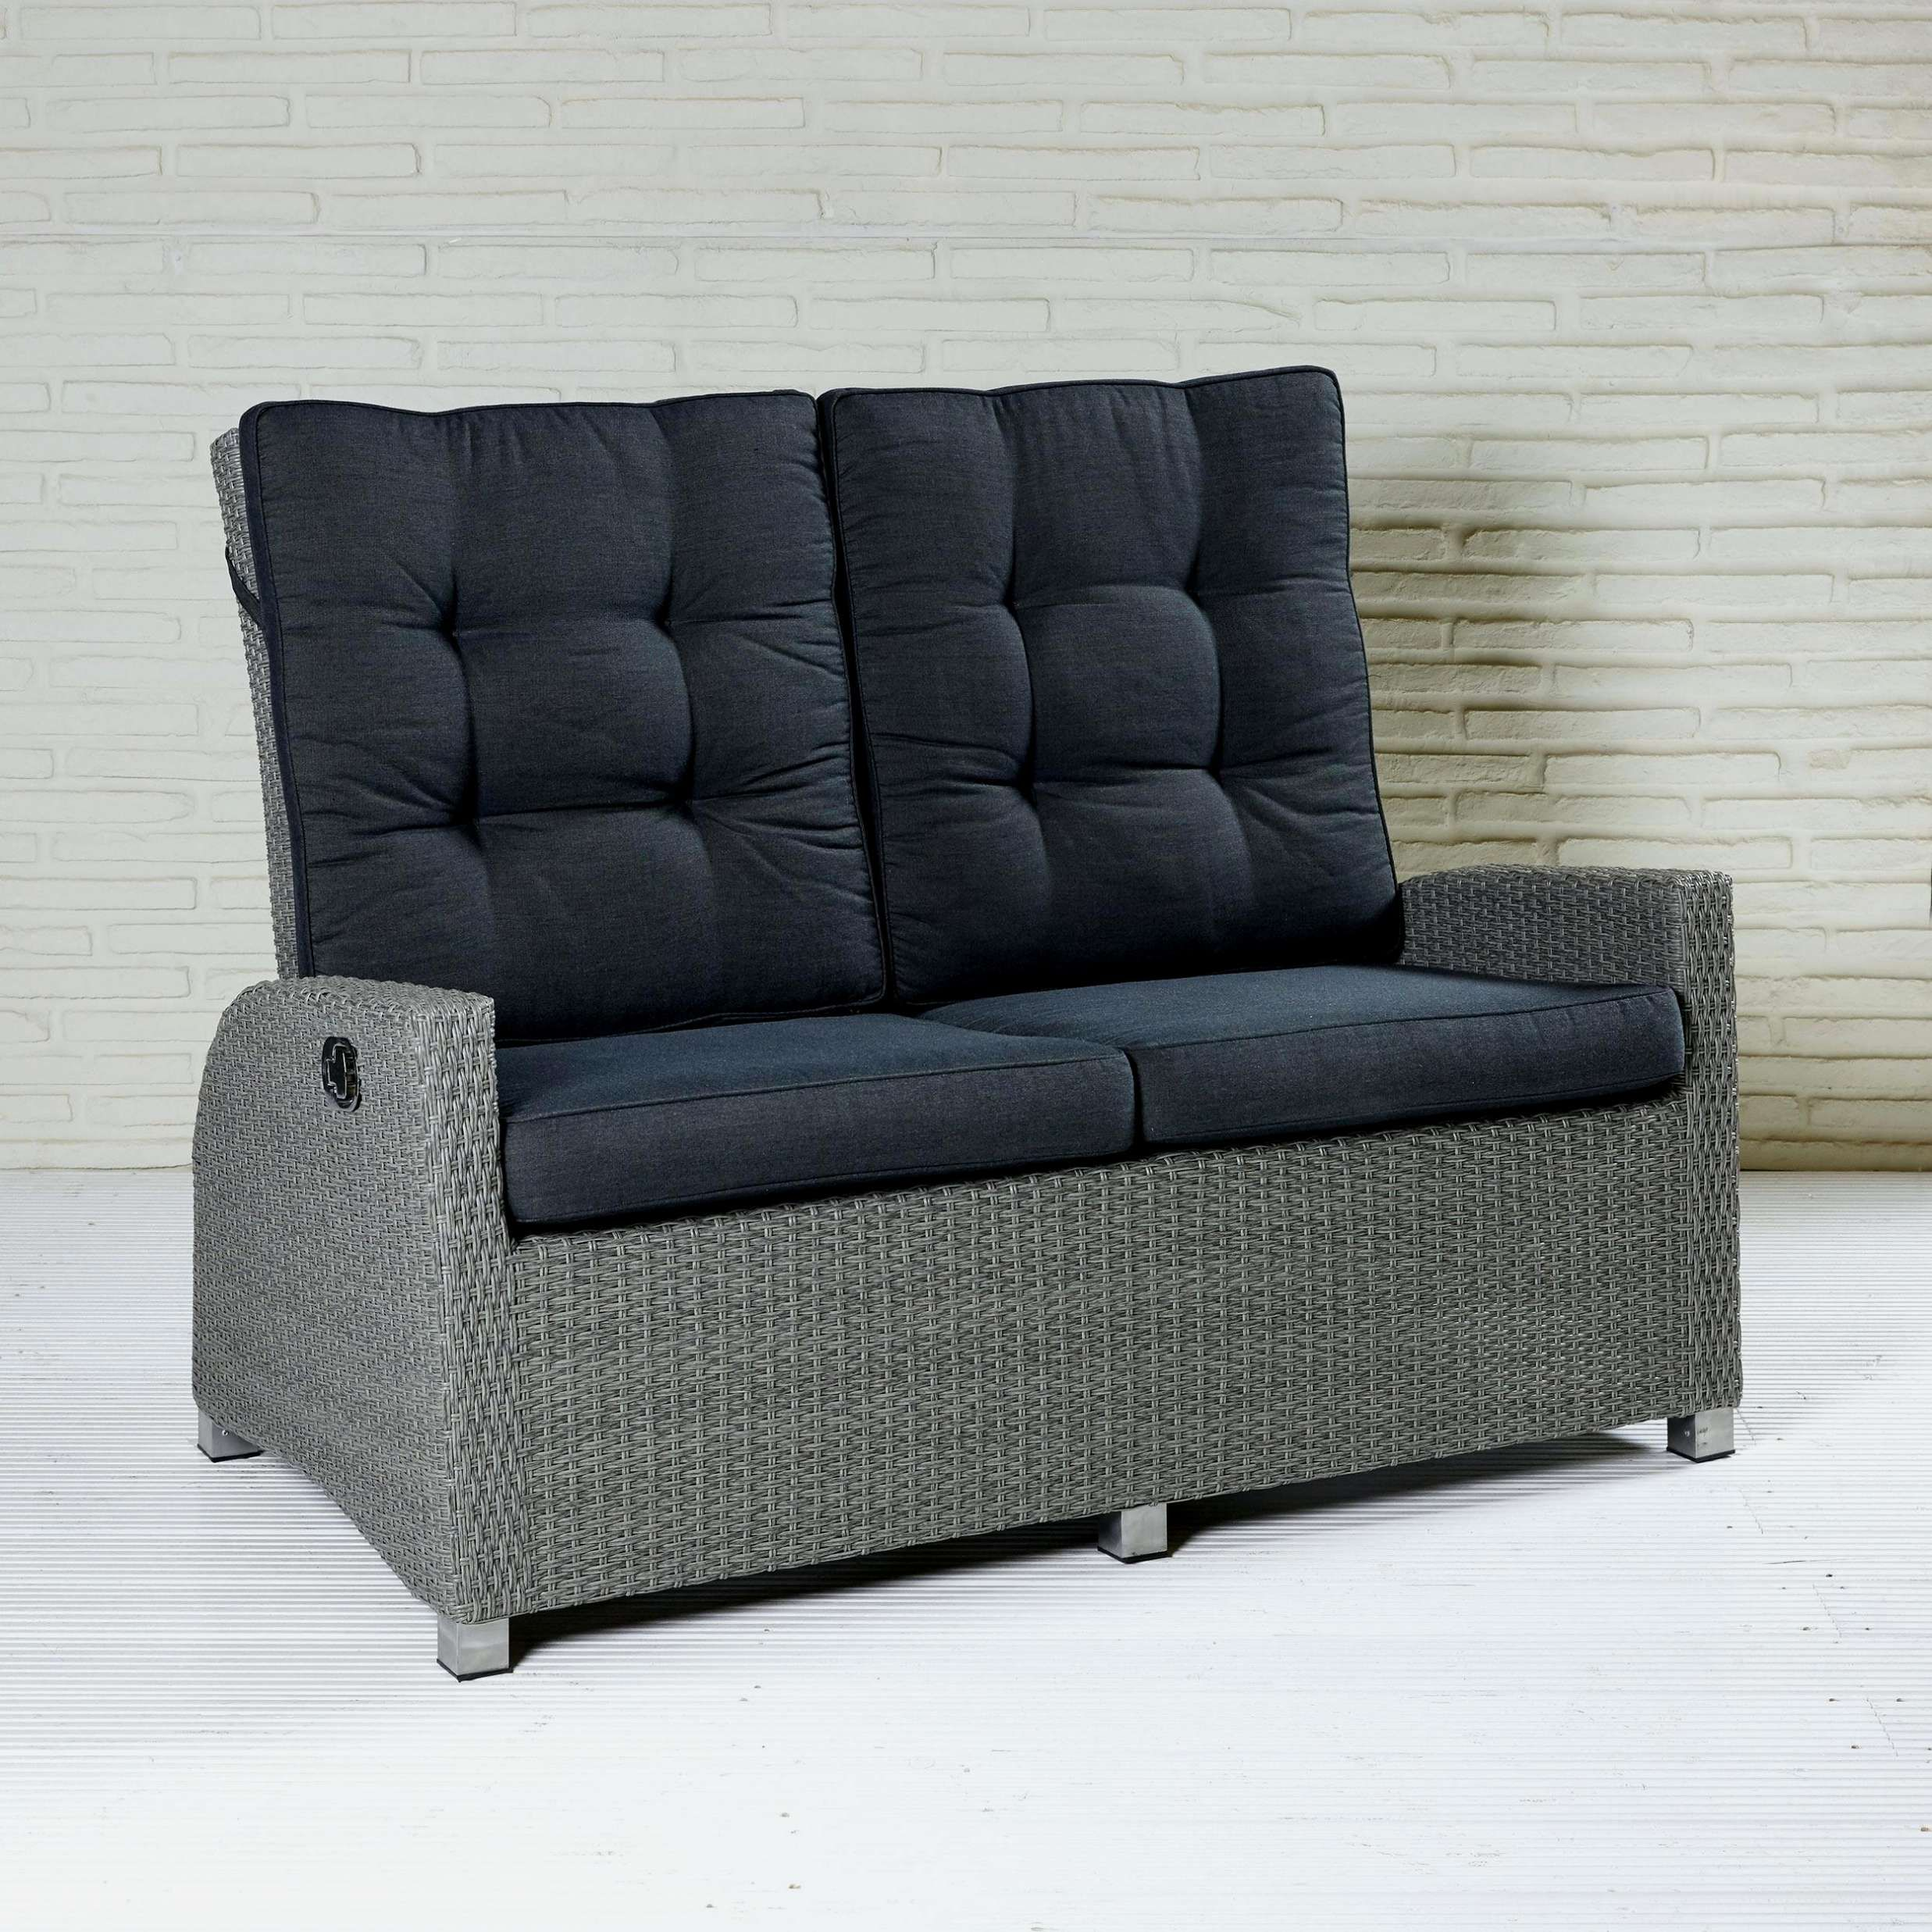 79 Wunderbar Couch Recamiere